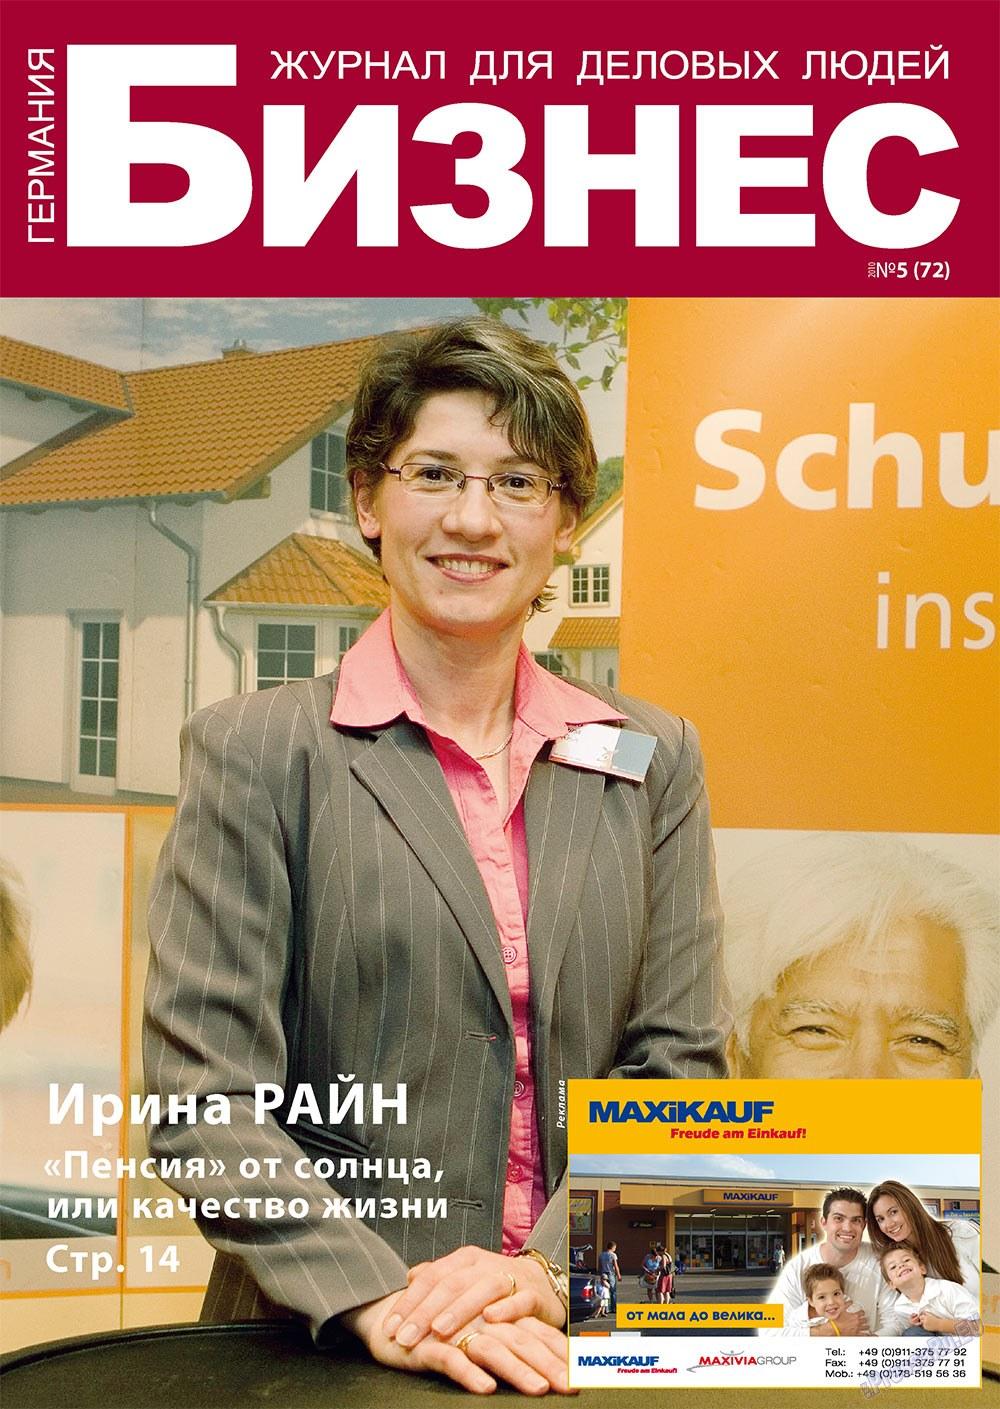 Бизнес (журнал). 2010 год, номер 5, стр. 1